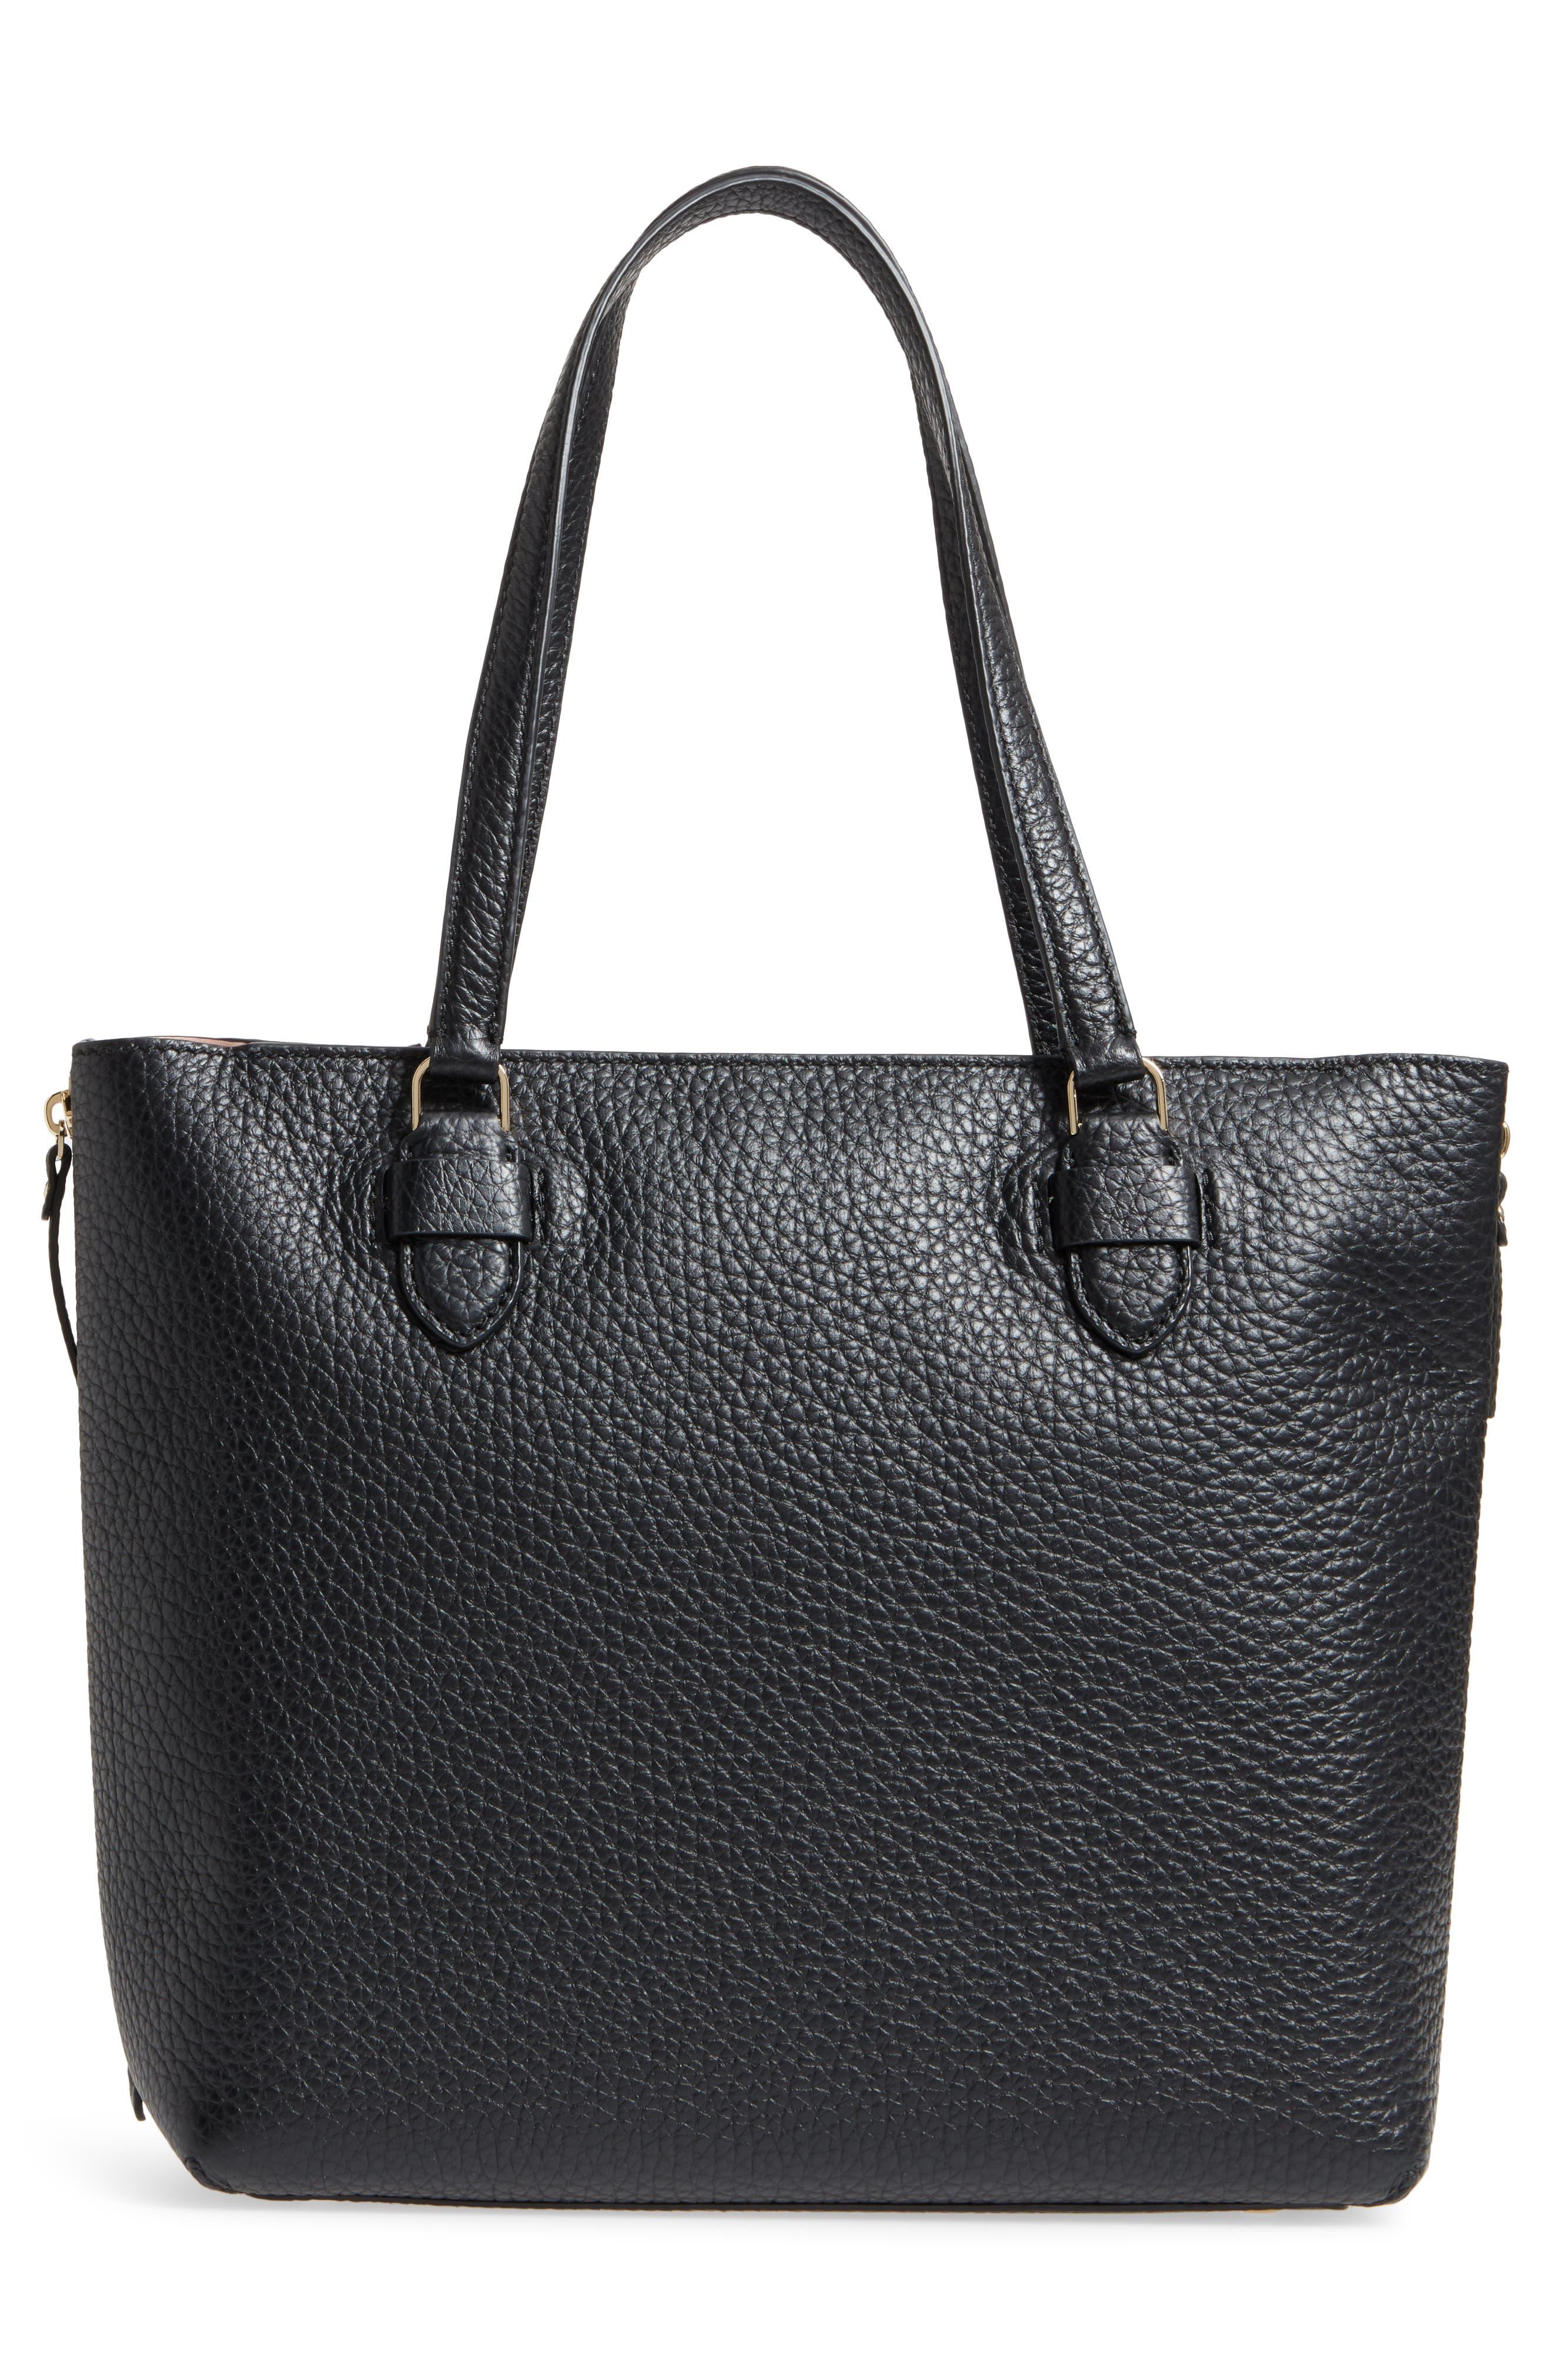 carter street - selena leather tote,                             Alternate thumbnail 3, color,                             Black